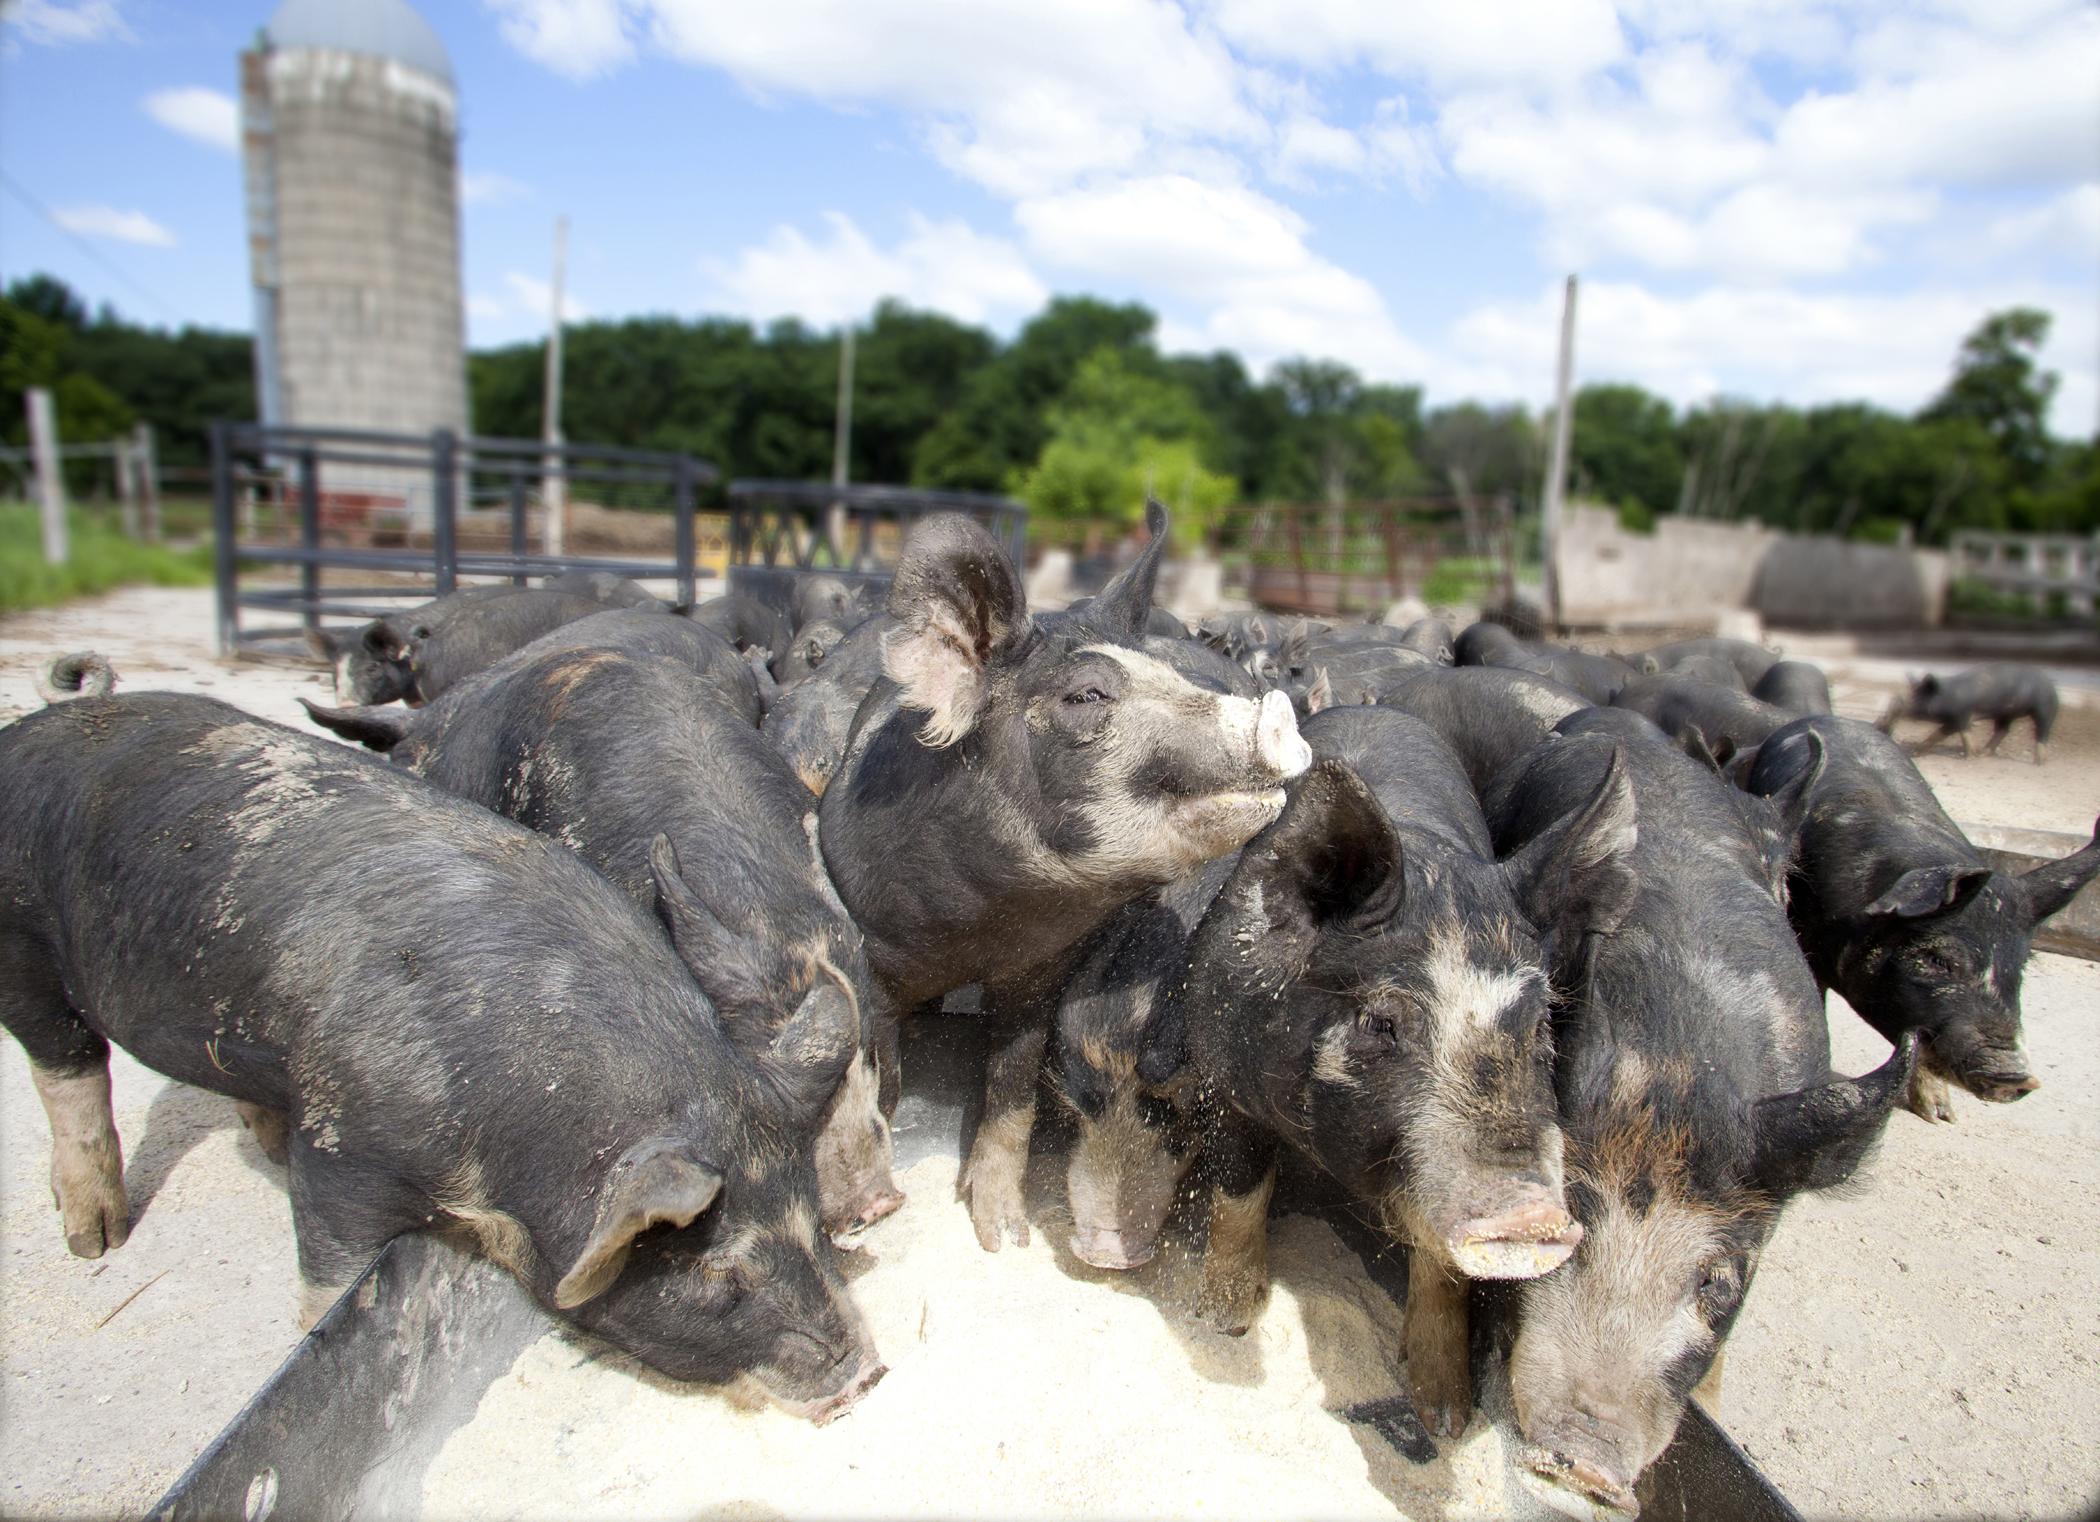 Farm photography pigs eating minnesota